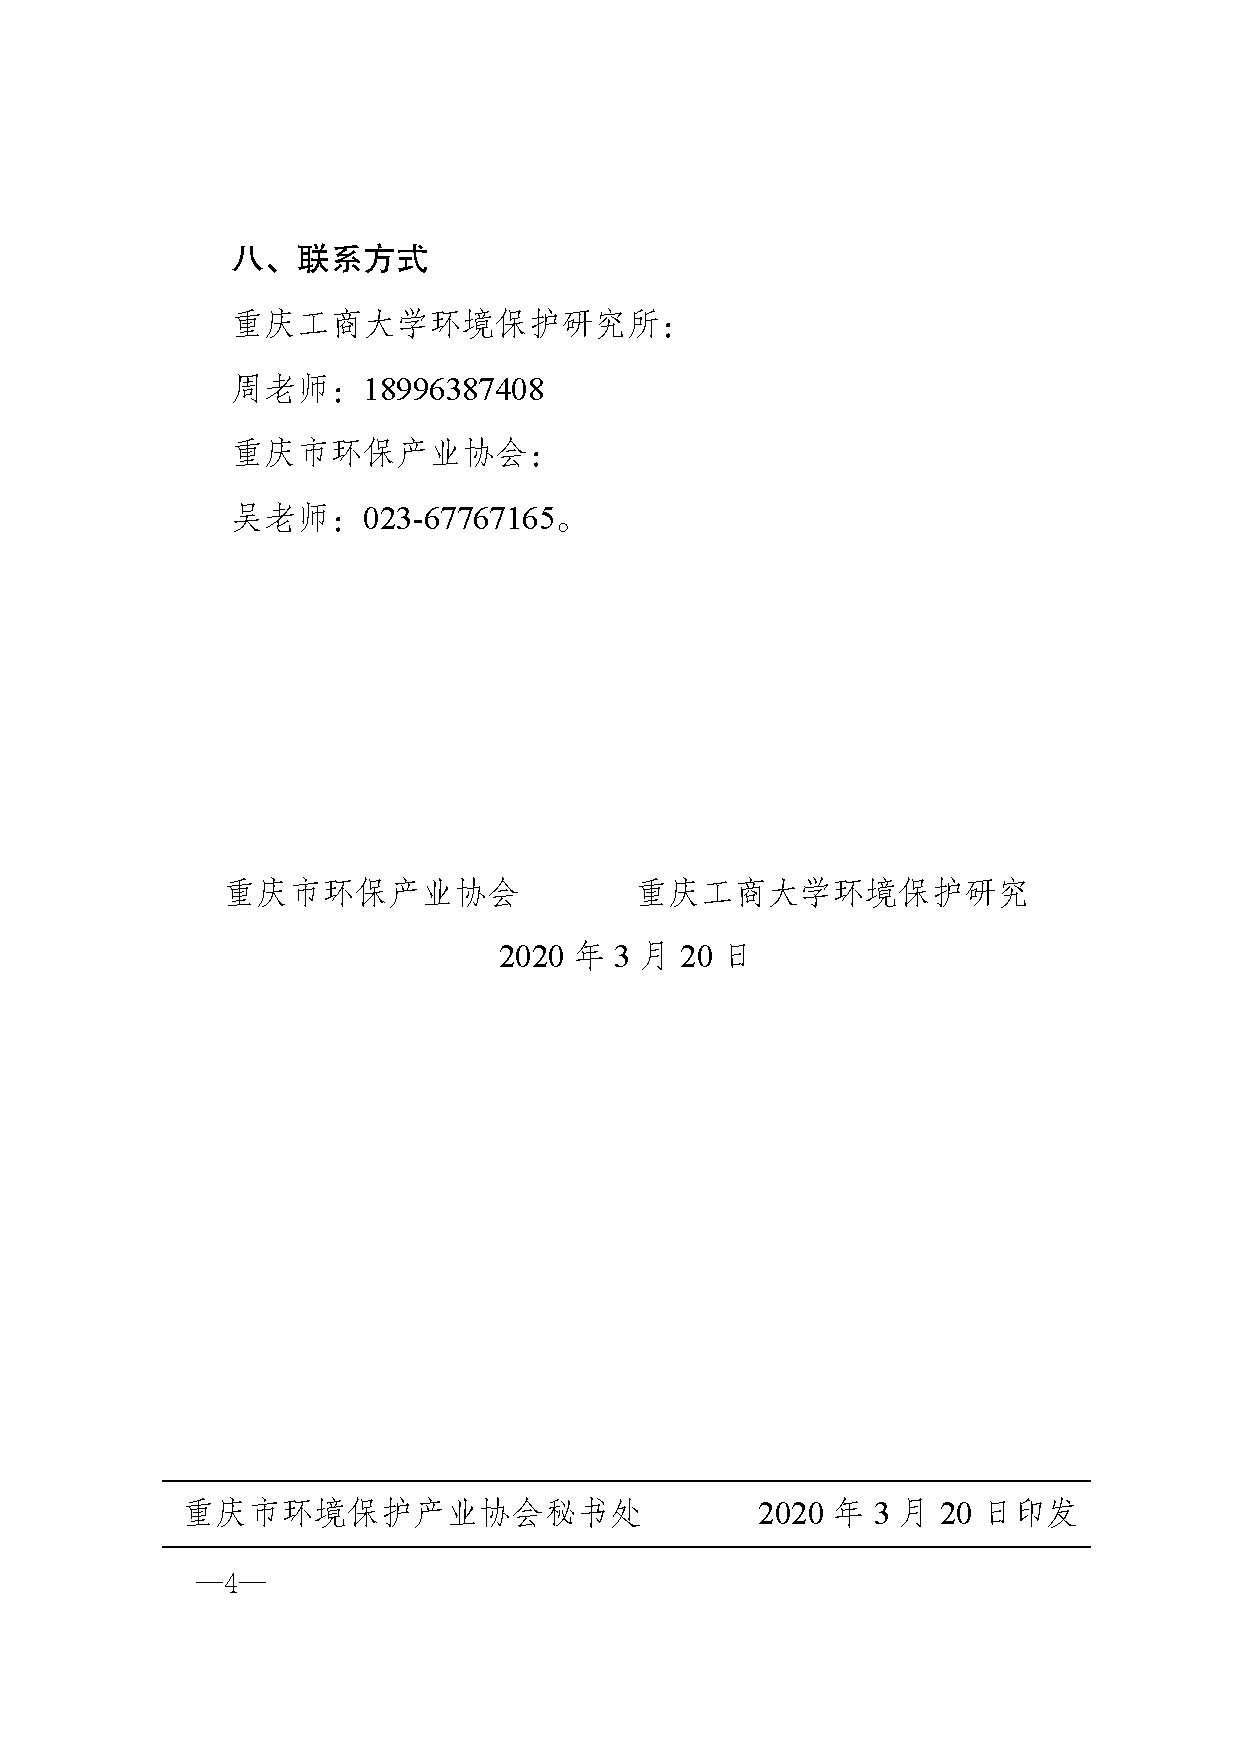 "OG真人网站重庆工商大学环境保护研究所关于举办""清洁生产审核培训班""的通知-渝环协〔2020〕7号-副本_页面_4"